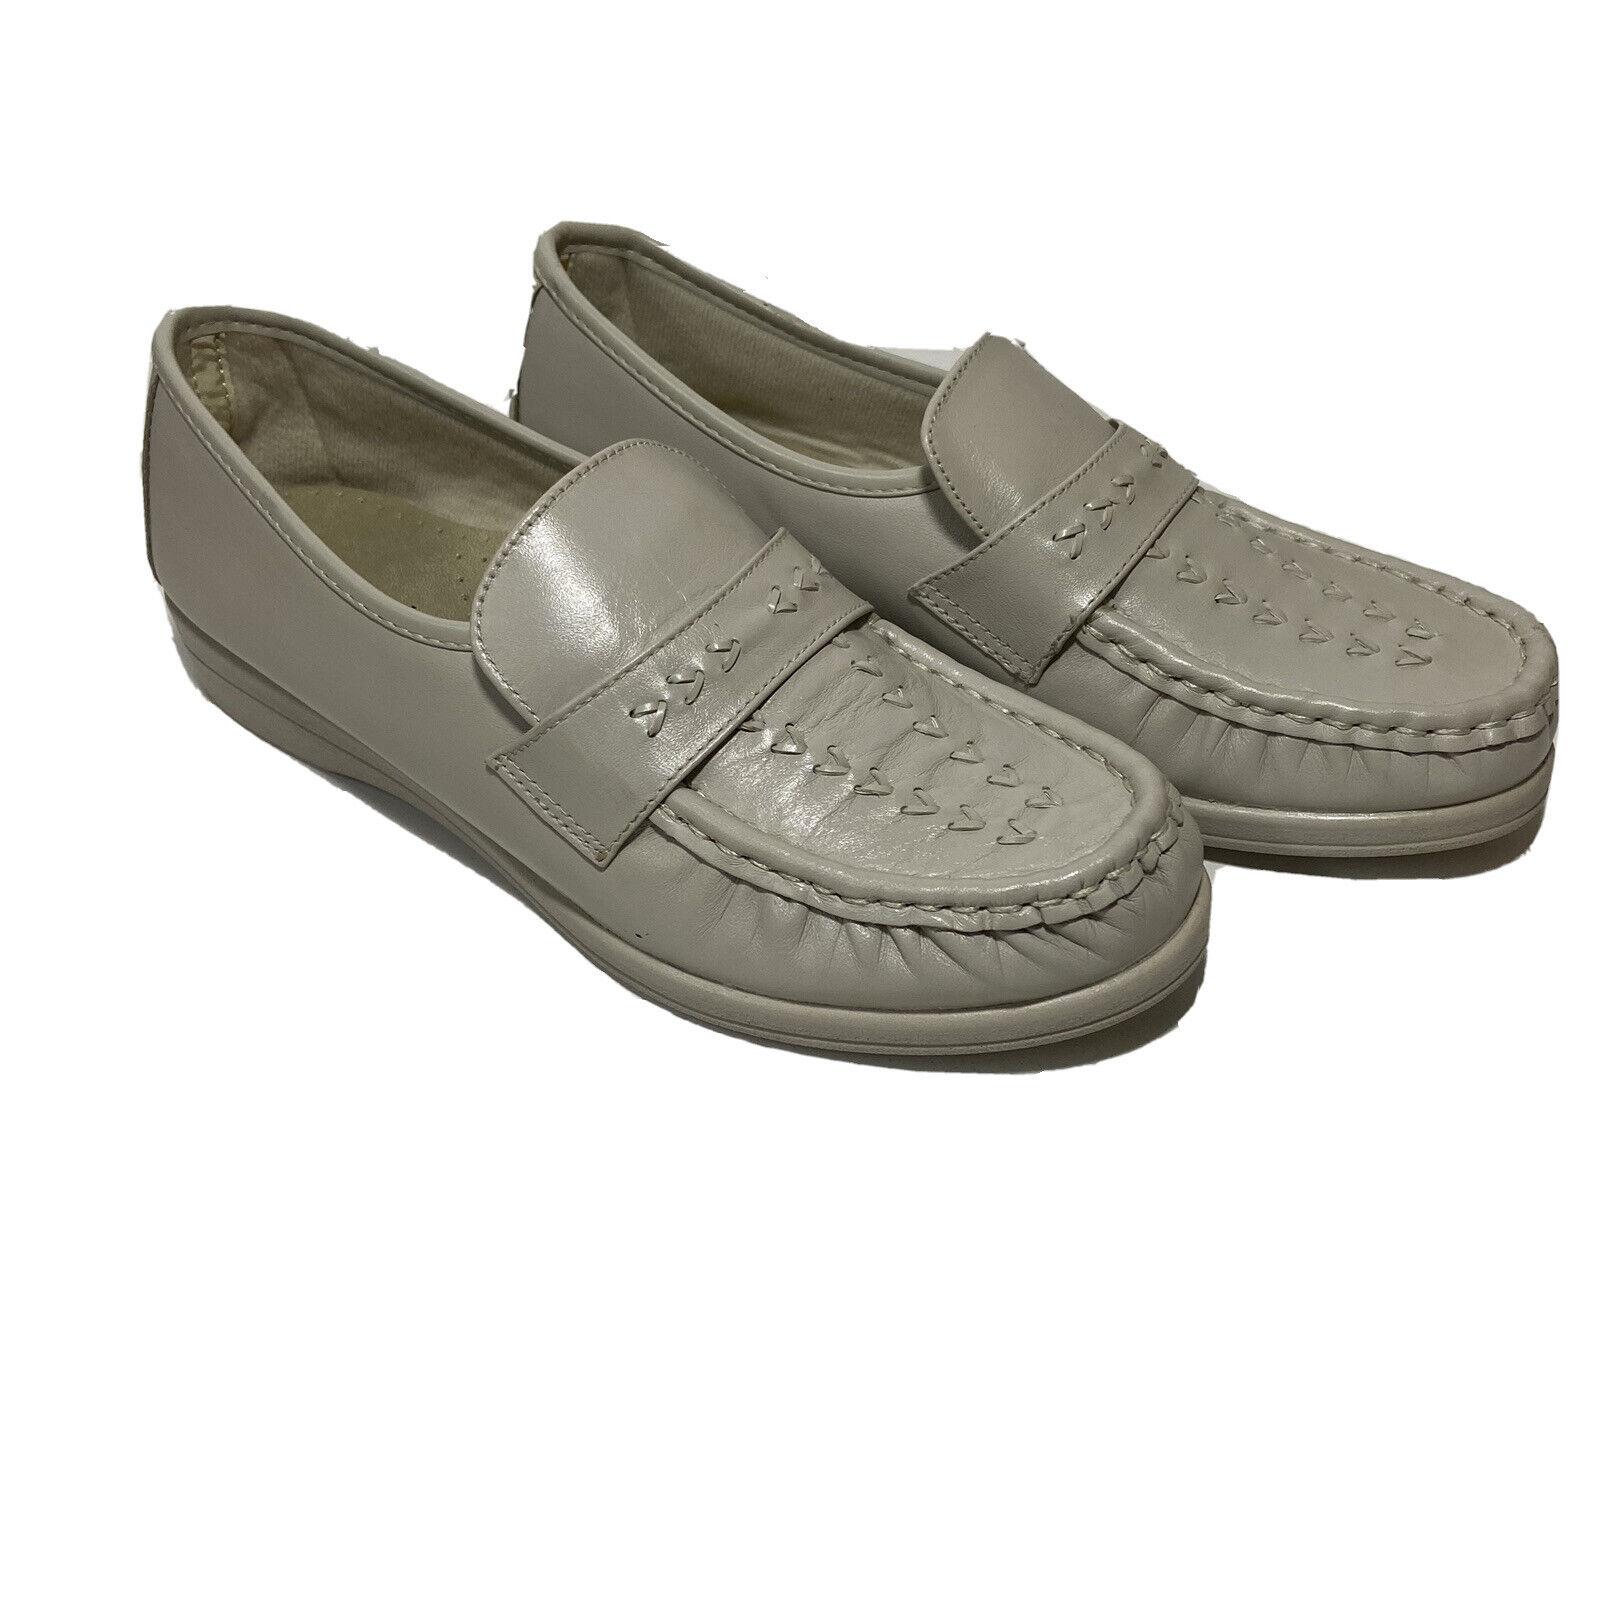 Softspots Womens Venus Lite Comfort Shoes Bone Leather Moc Toe Slip On 10W New